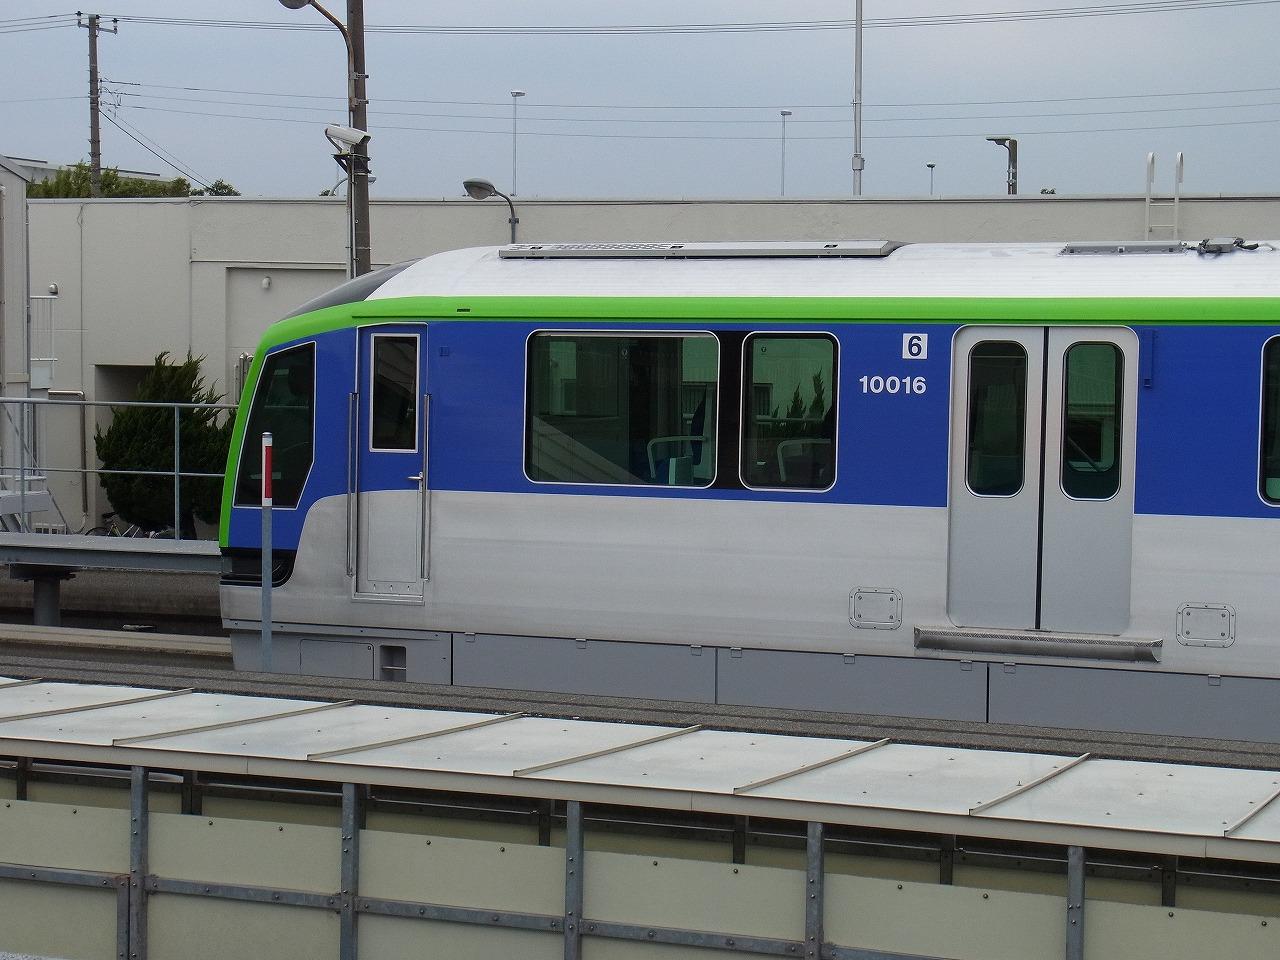 20140420-8